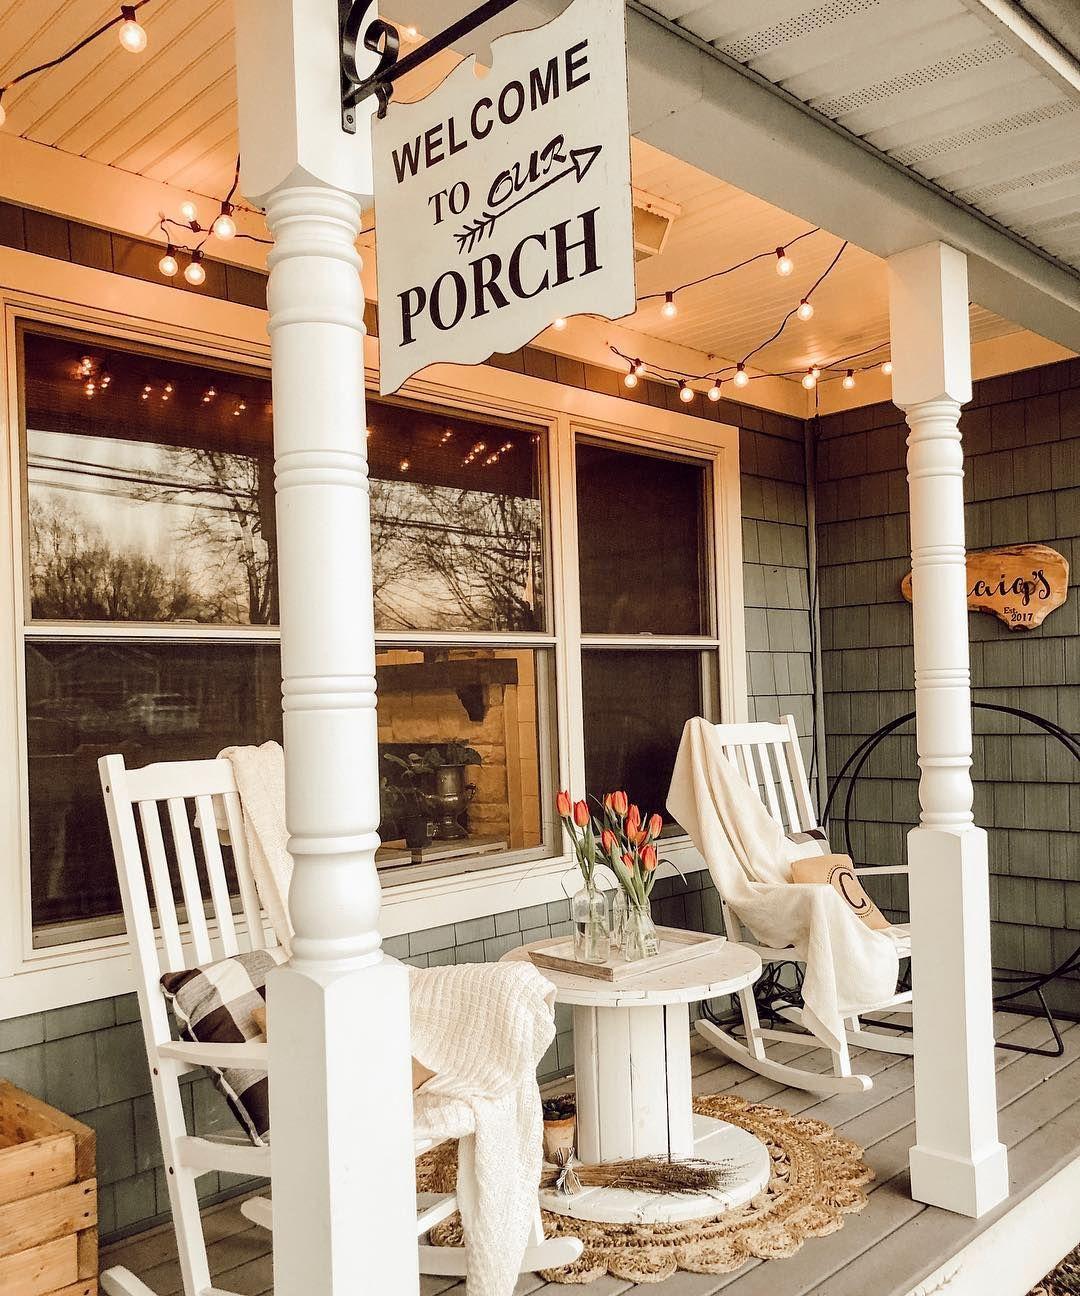 Daily Deals on Vintage, Rustic, Farmhouse Decor